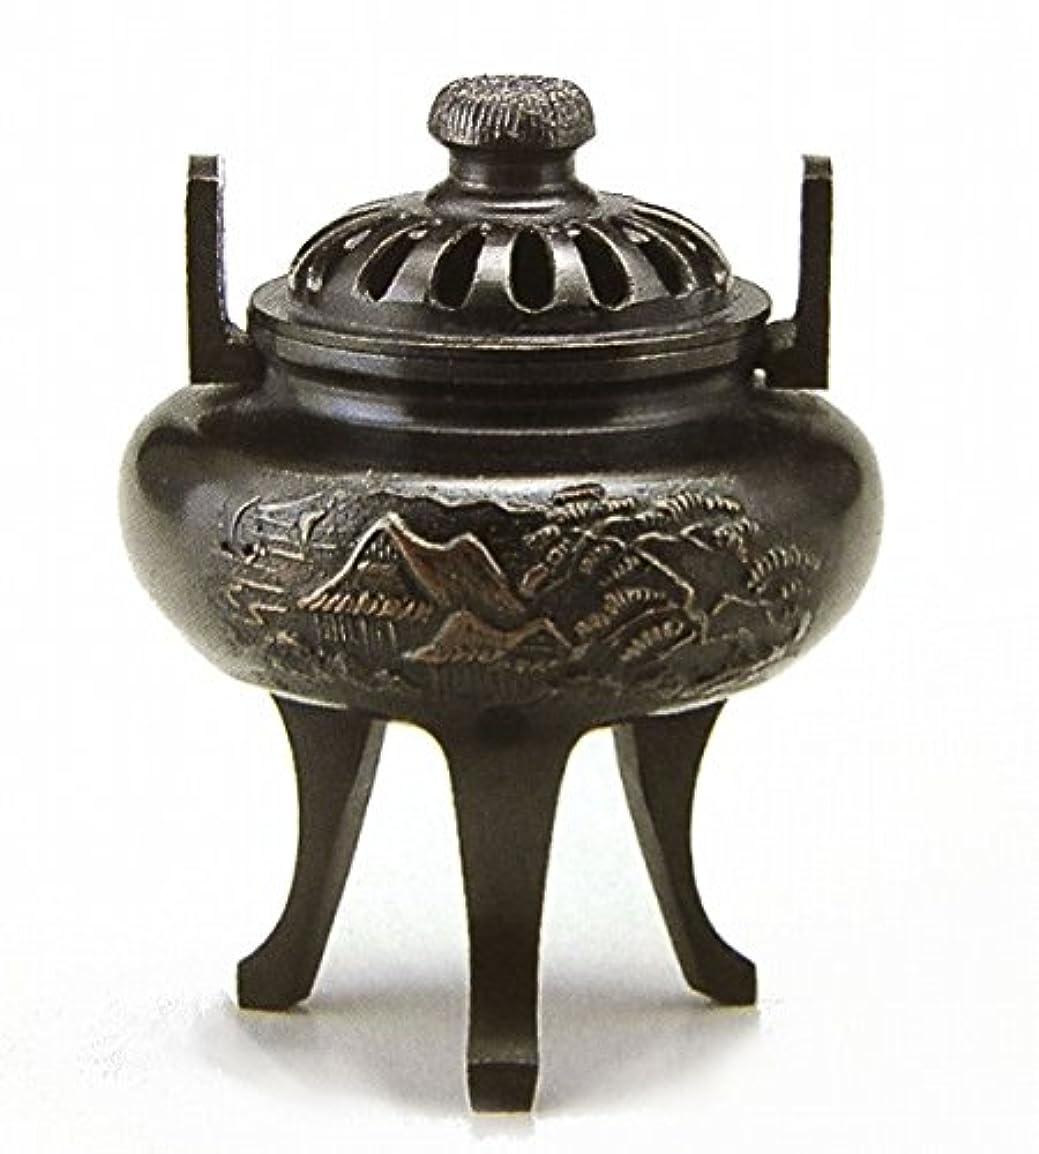 インチ商品衣服『菊蓋山水香炉』銅製